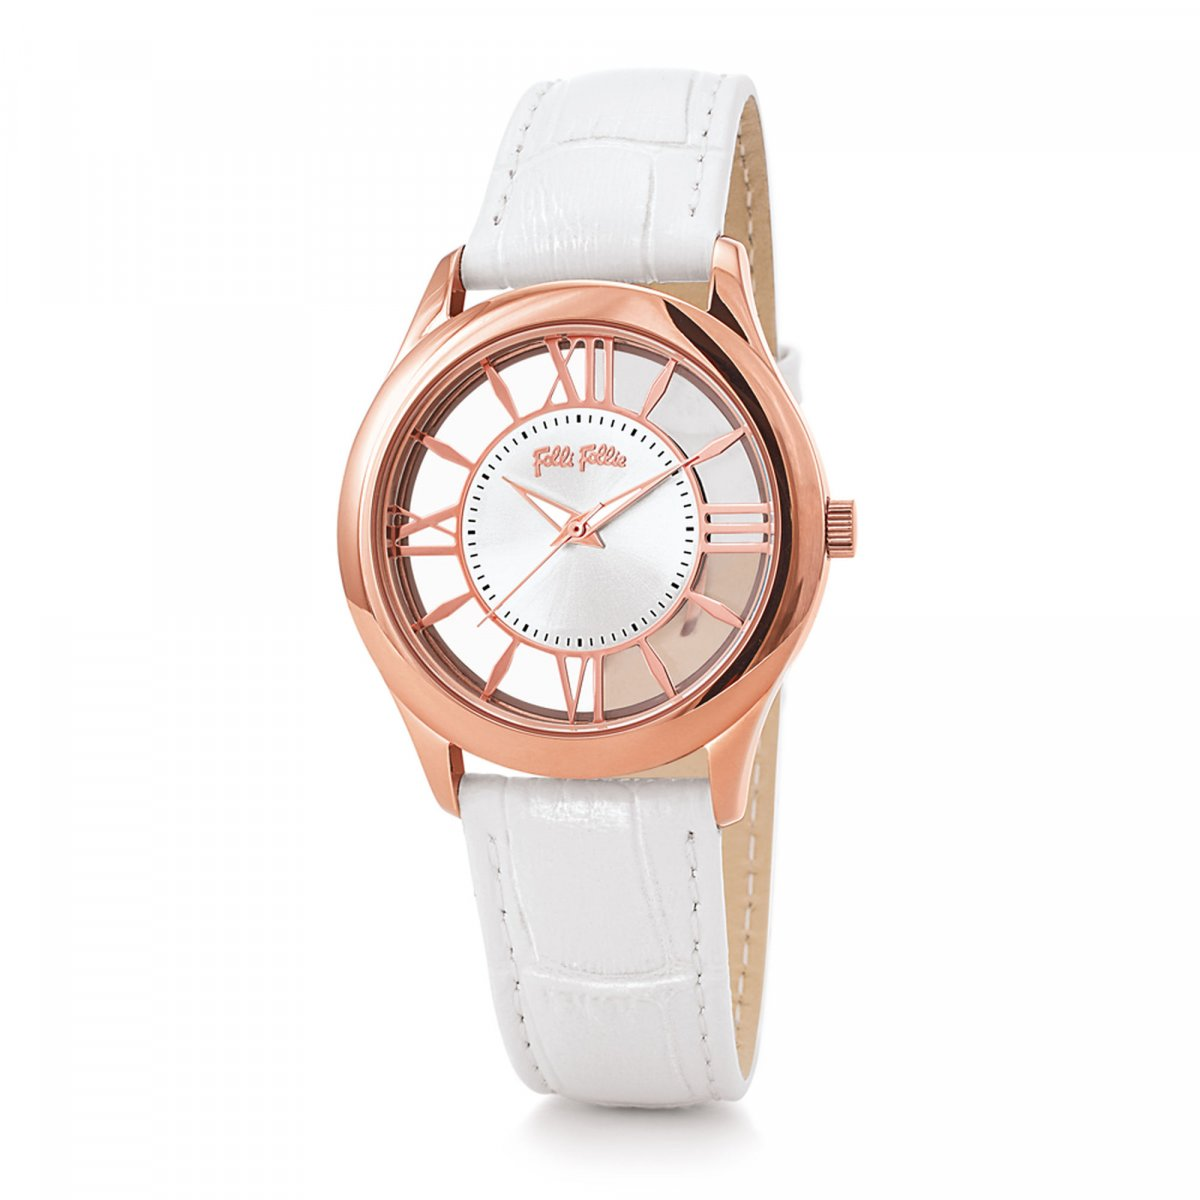 Hodinky FOLLI FOLLIE Time Illusion Medium Case Leather Watch